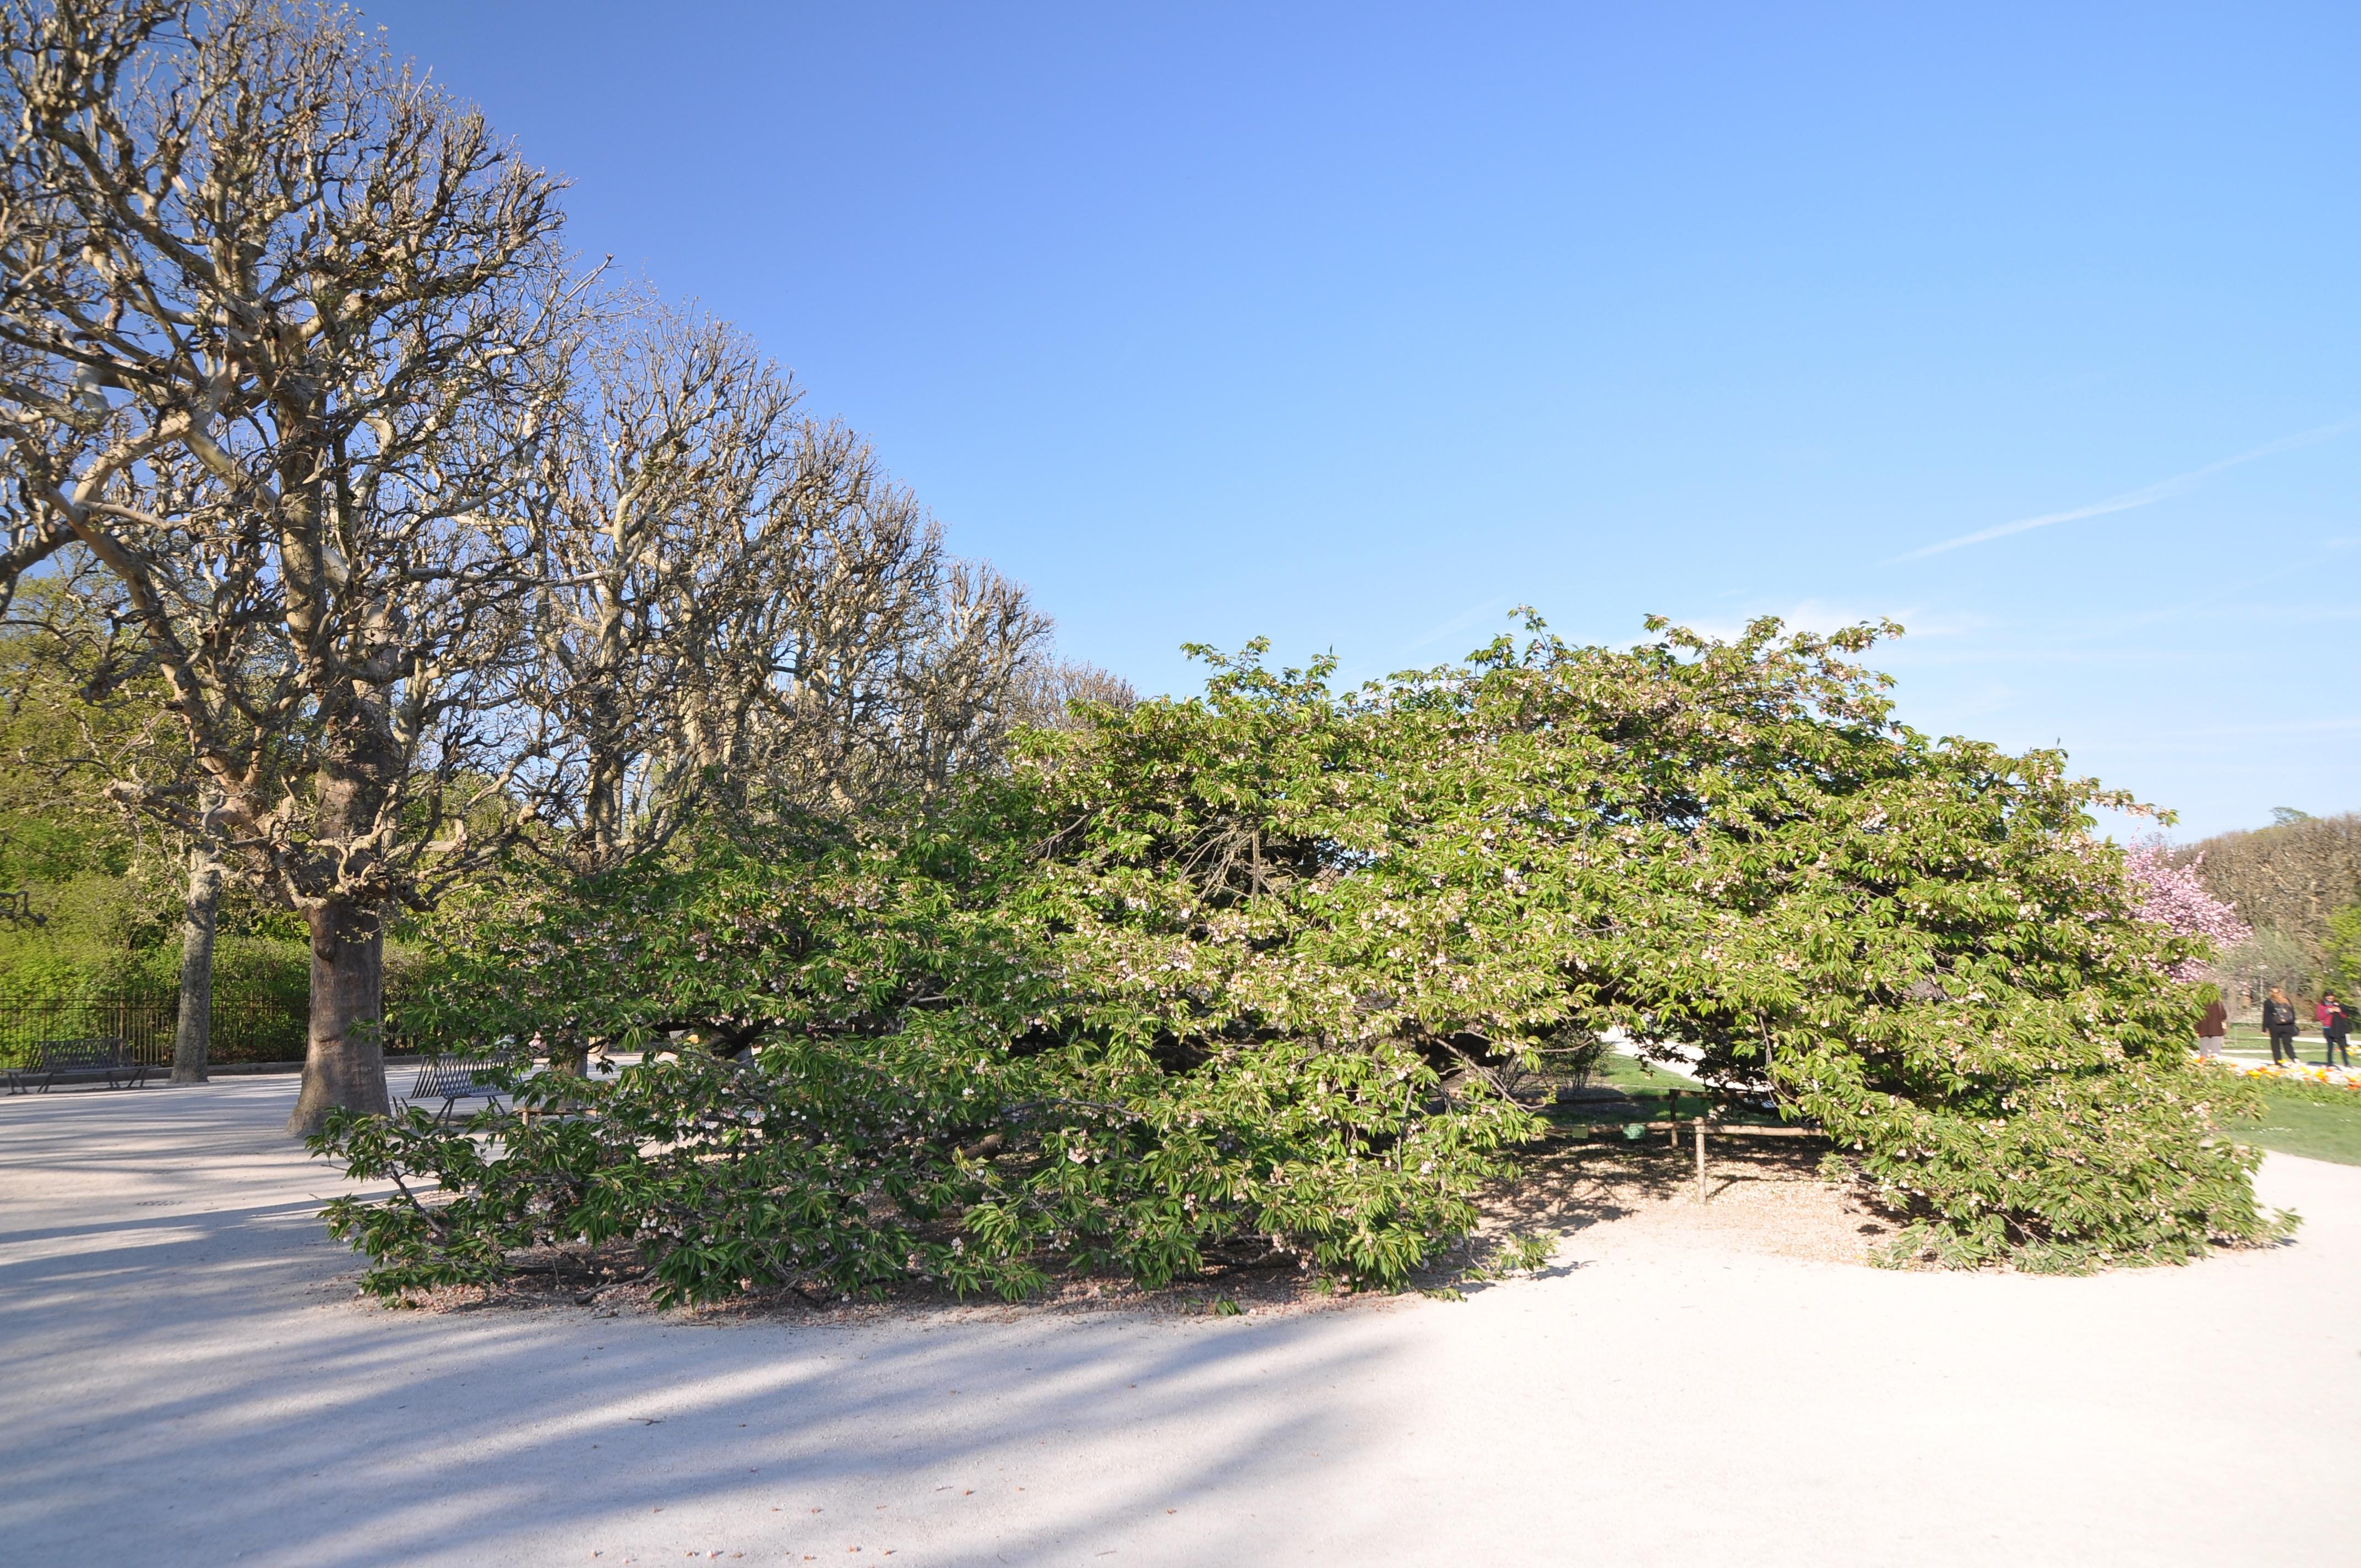 File Prunus Sato Zakura Shirotae in the Jardin des Plantes